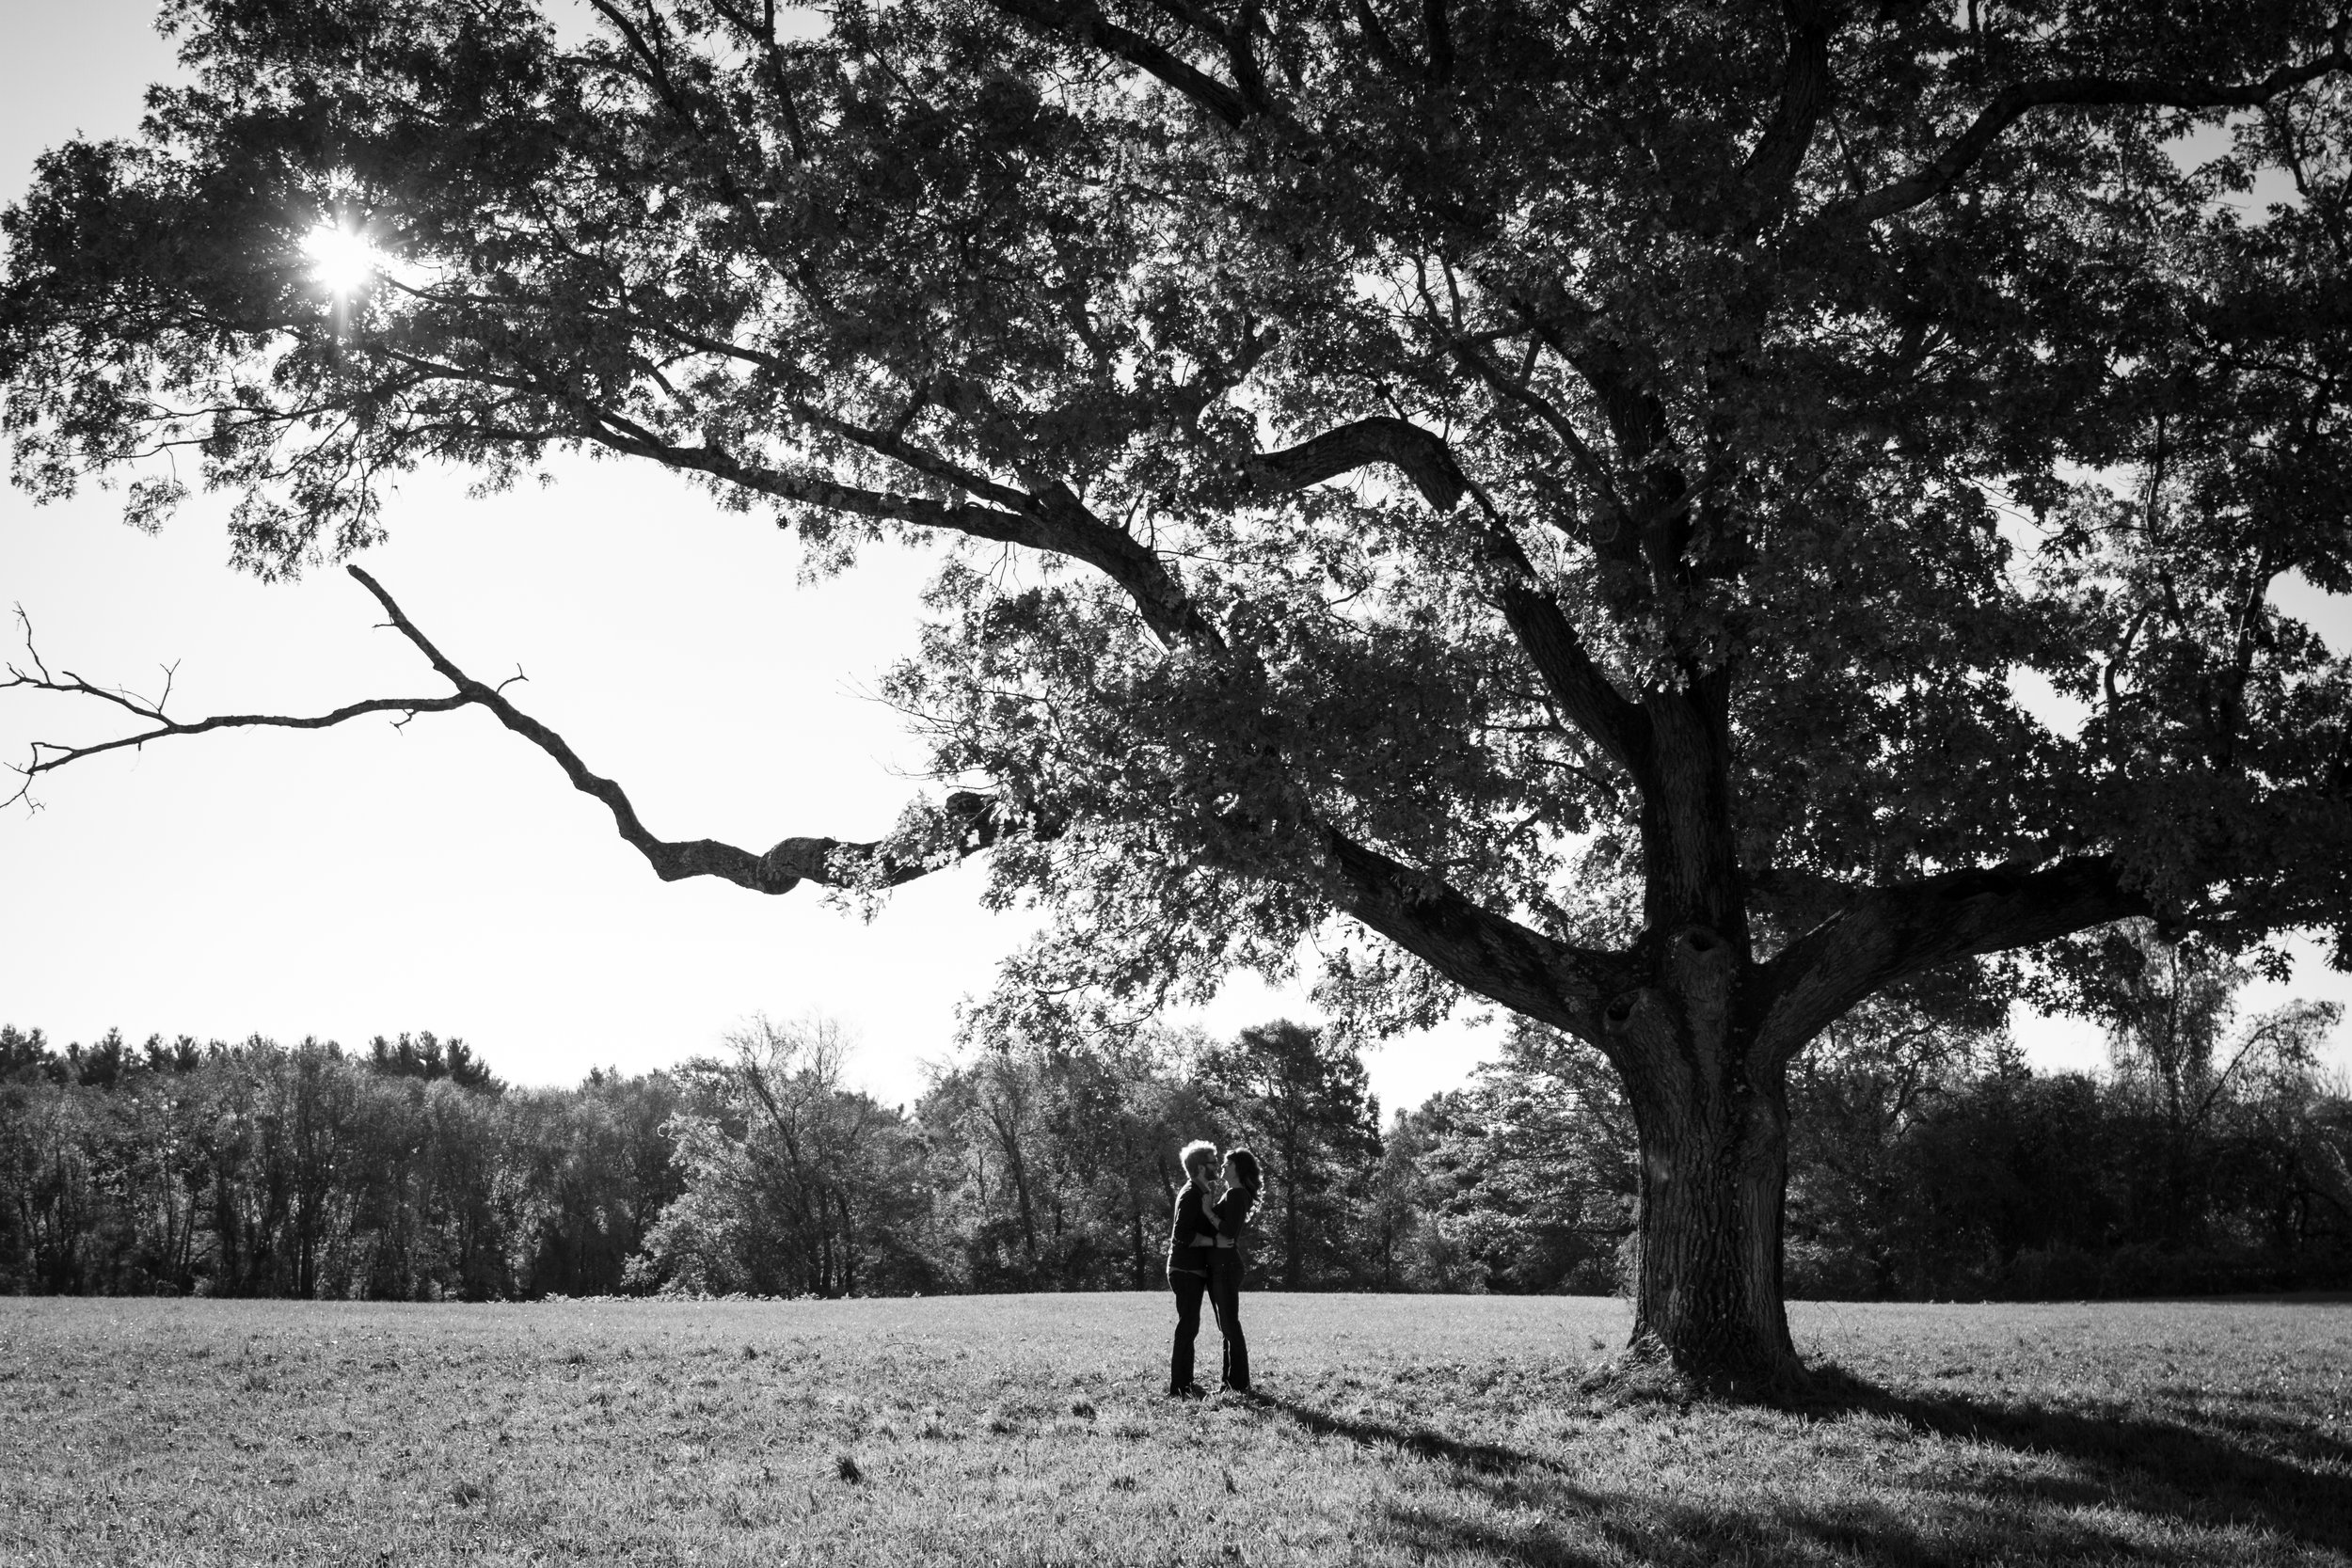 Molly and Sam Duxbury South Shore Massachusetts Engagement Photographer Shannon Sorensen PhotographyMolly and Sam Duxbury South Shore Massachusetts Engagement Photographer Shannon Sorensen Photography